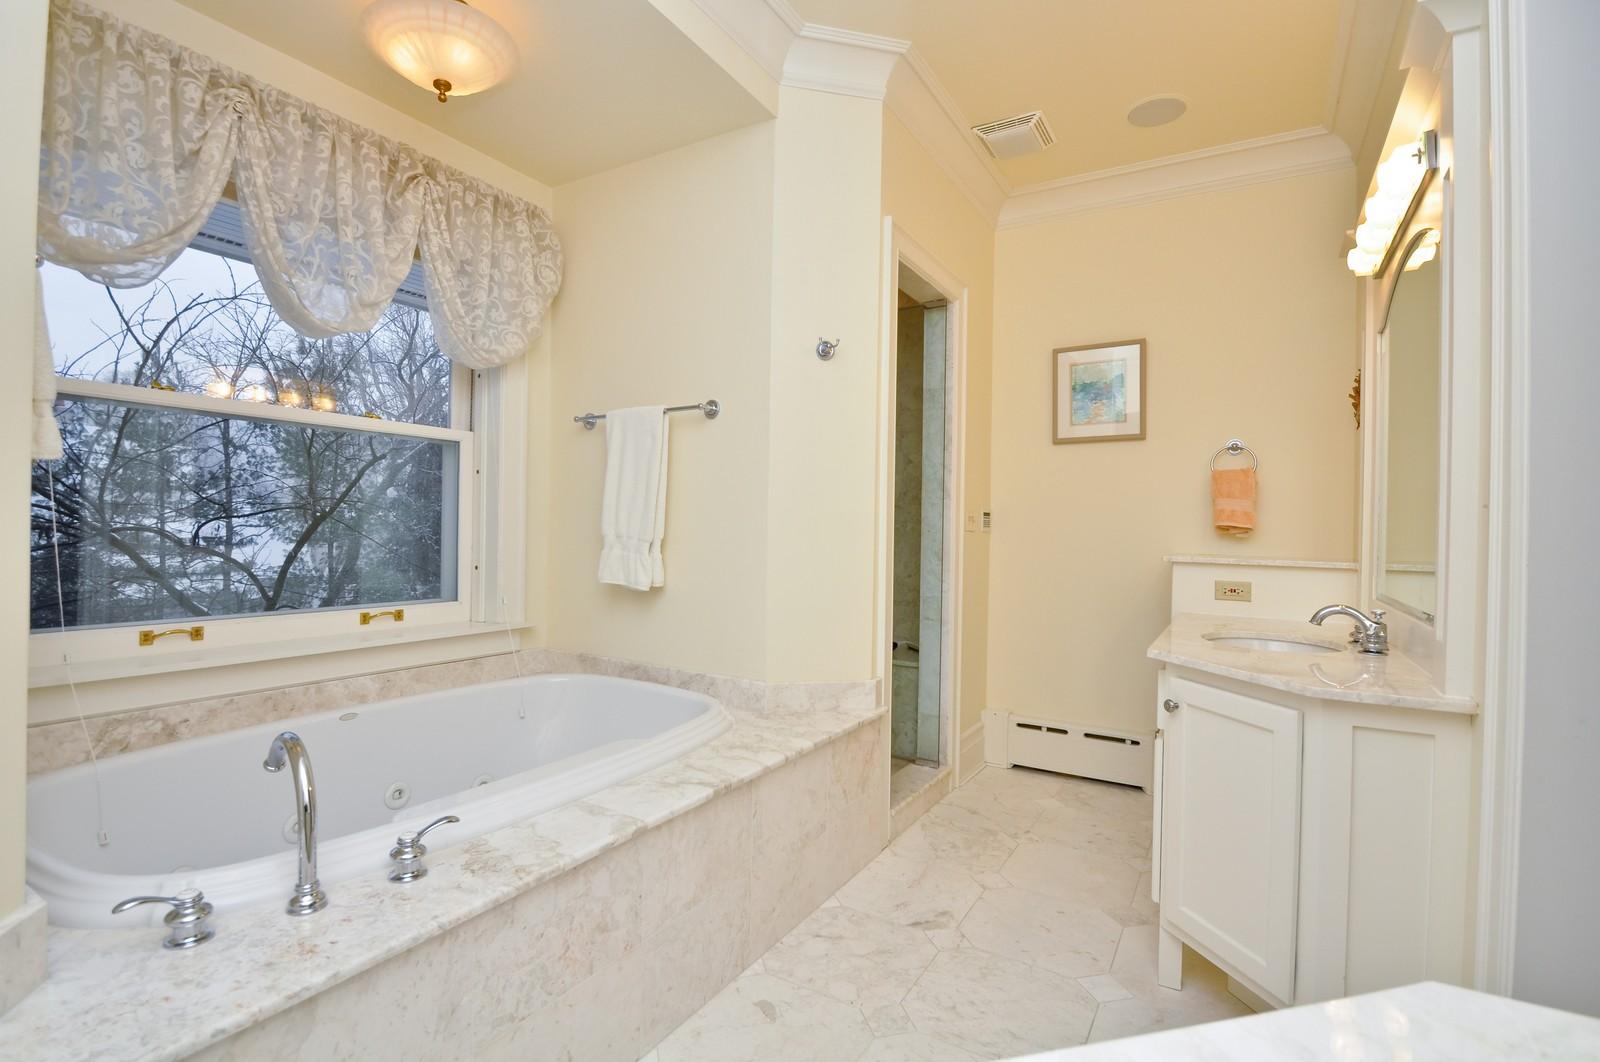 Real Estate Photography - 486 Greenleaf, Glencoe, IL, 60022 - Master Bathroom